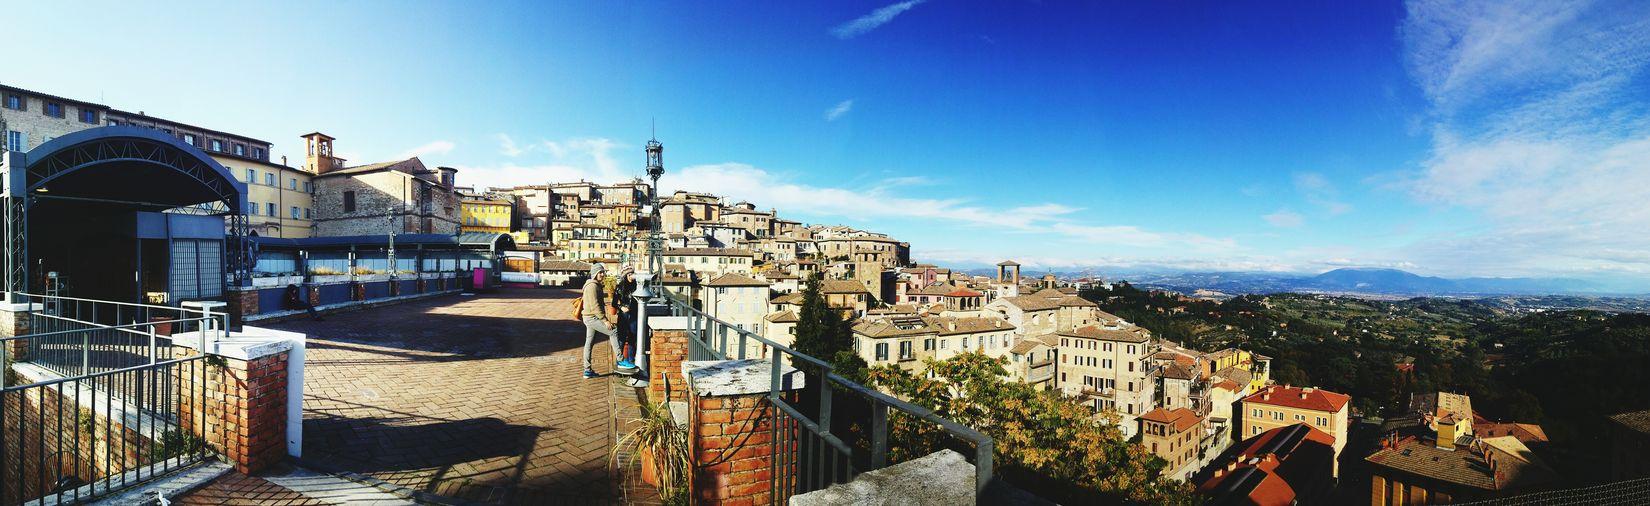 Perugia Italy Journey Summer Views Panoramic View Eyeemgallery Eyeemsky Myphoto Art Urban Splendour